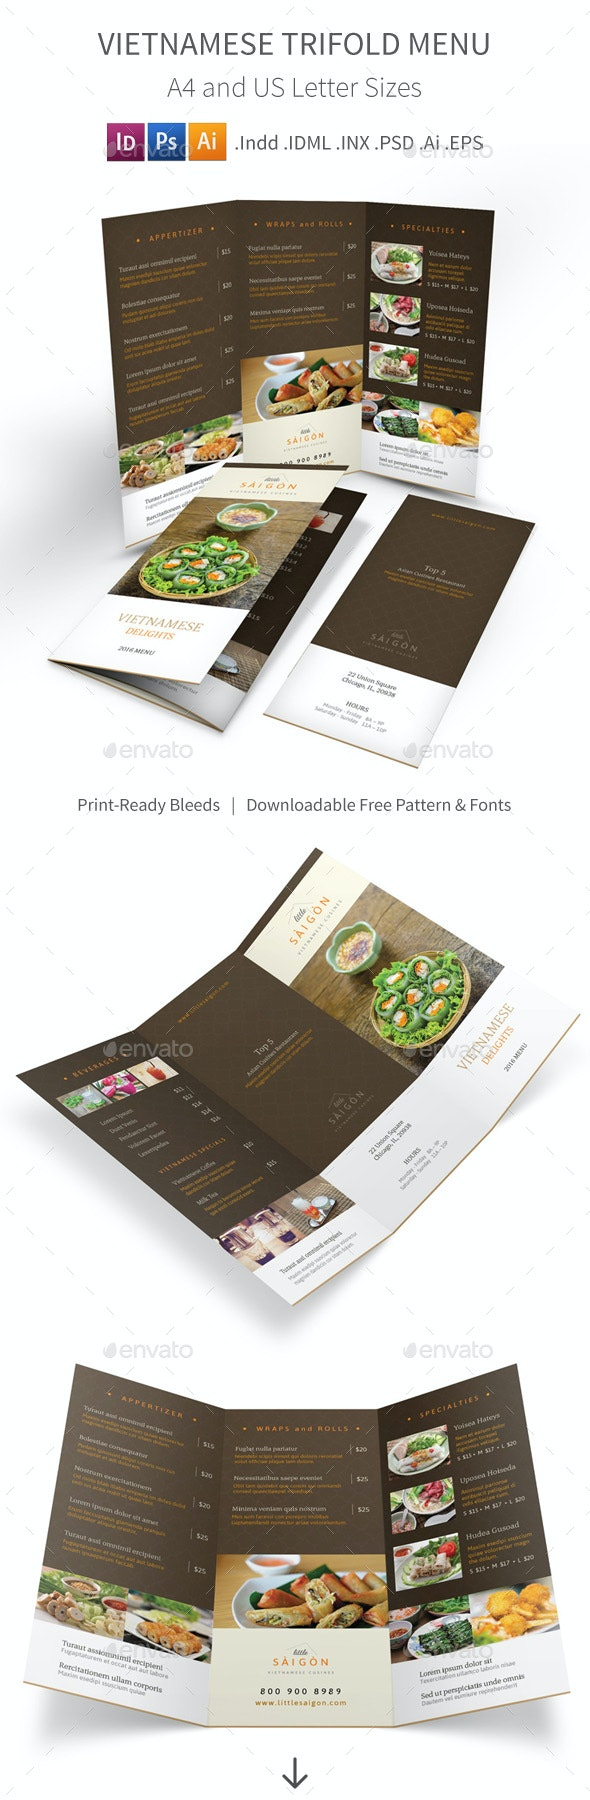 Vietnamese Restaurant Trifold Menu 2 - Food Menus Print Templates